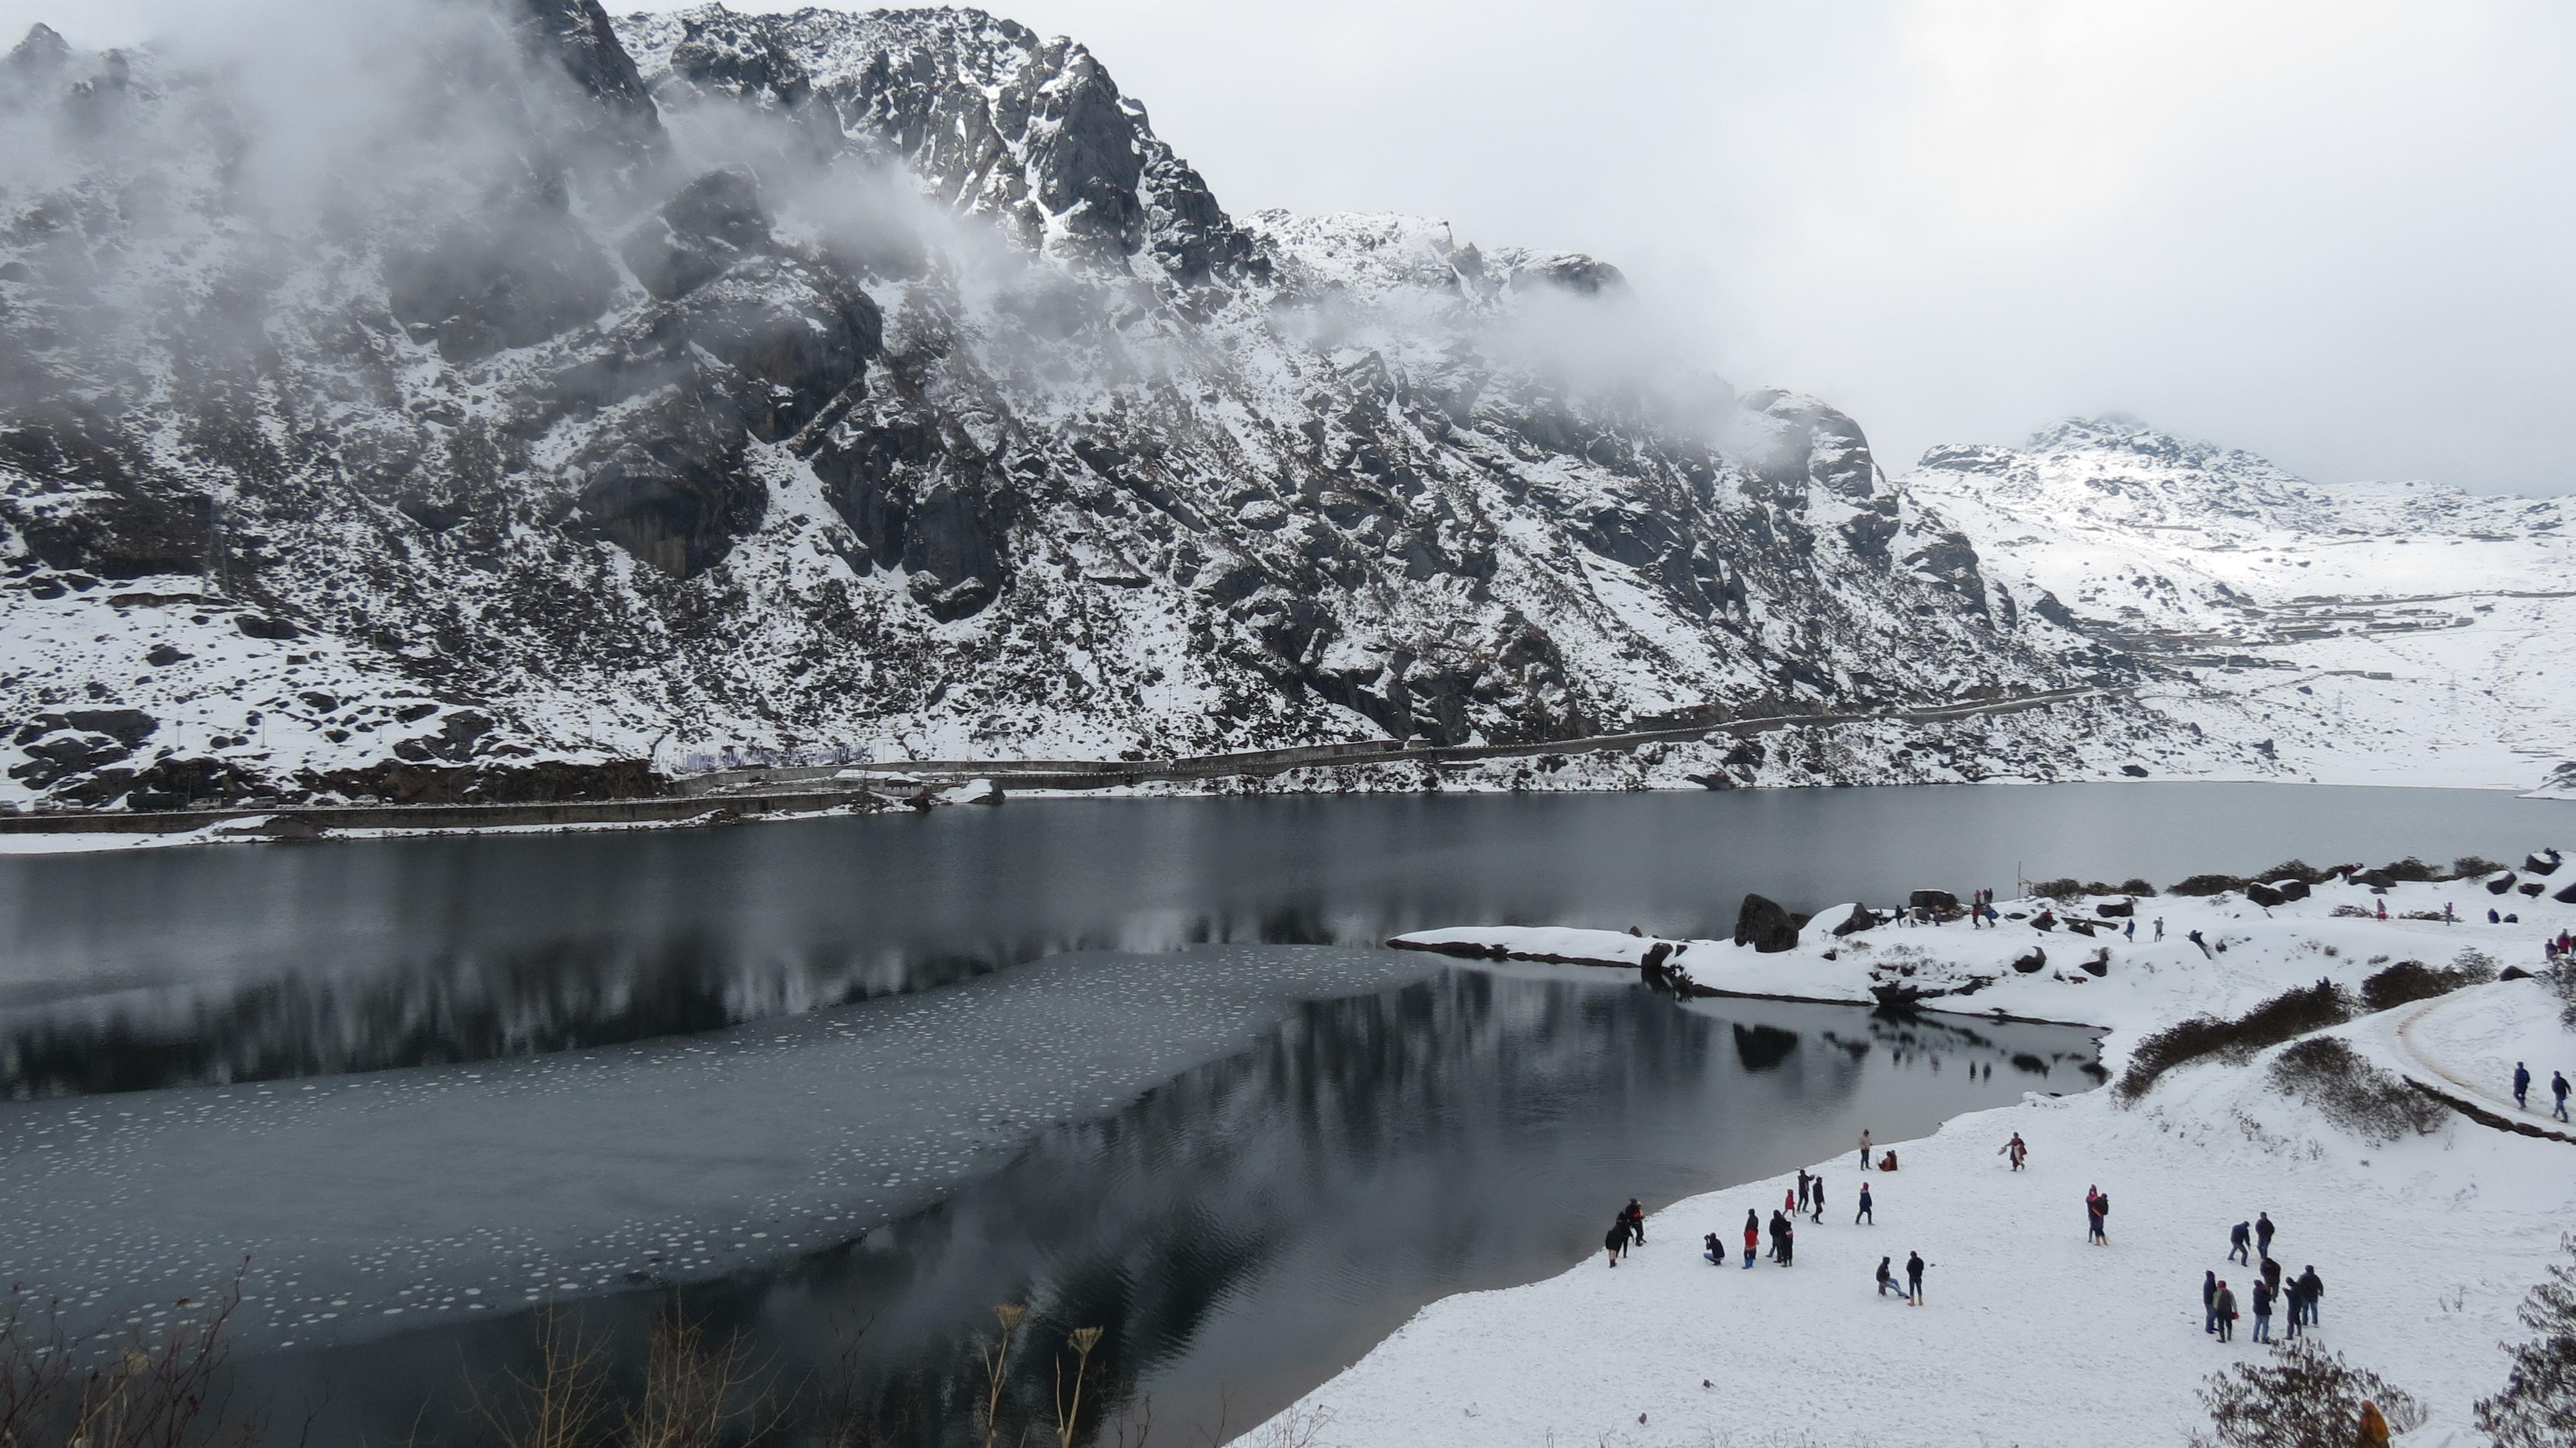 Snowfall in Sikkim